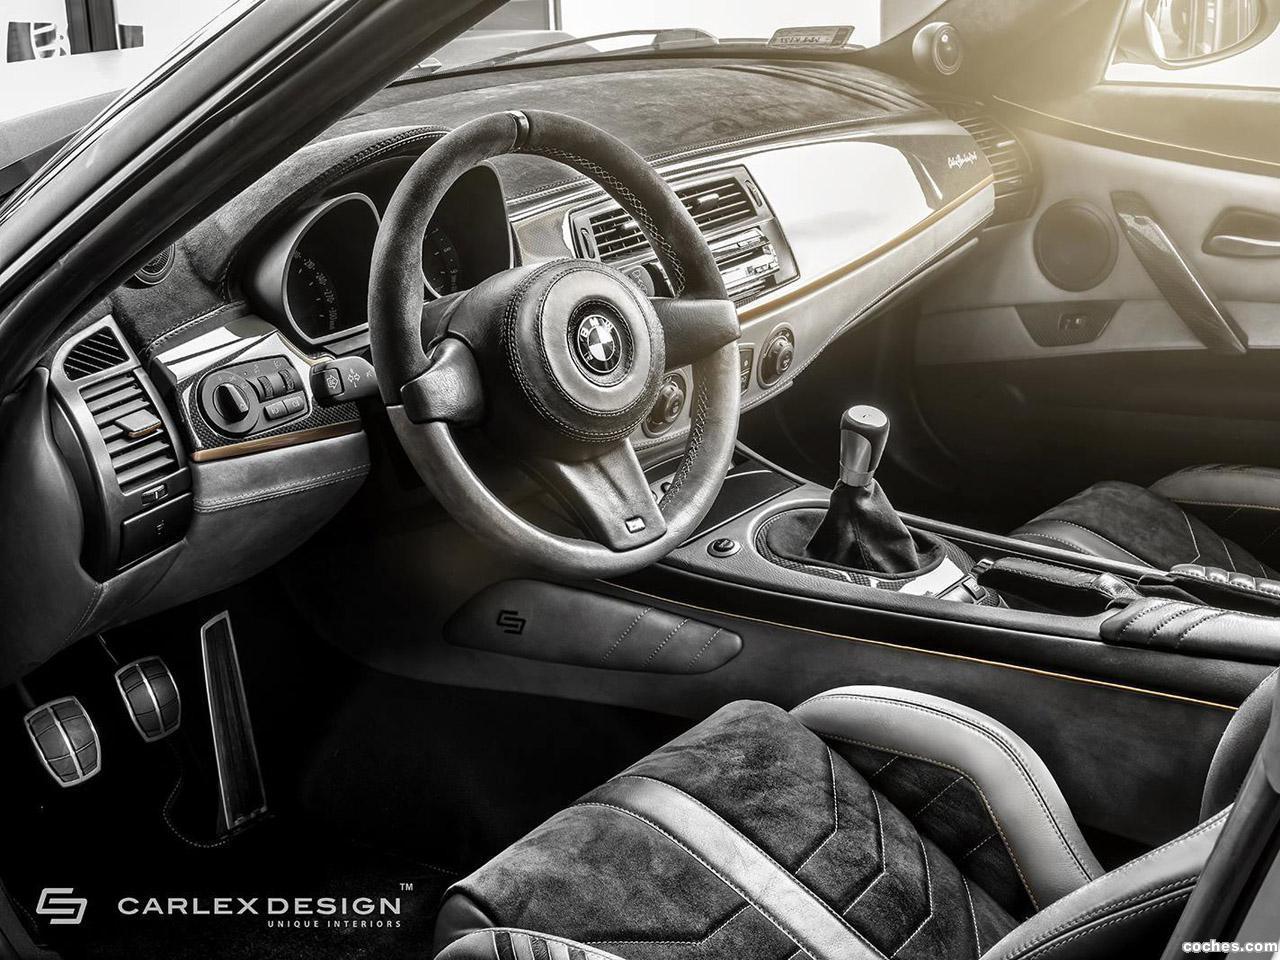 Foto 6 de BMW Z4 Carlex Design 2015